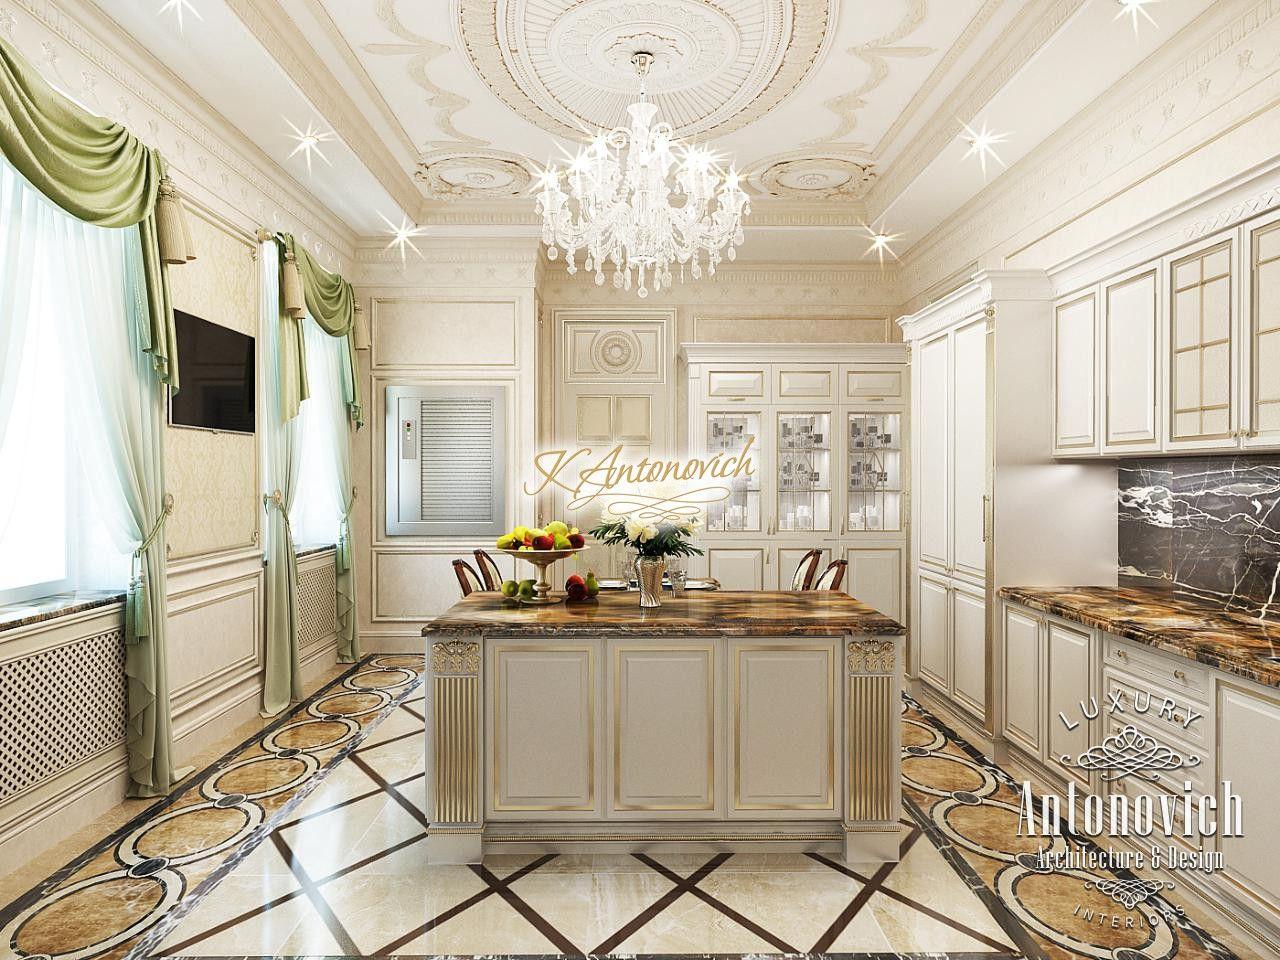 Pin By Luxury Antonovich Design On Exclusive House Interior Design